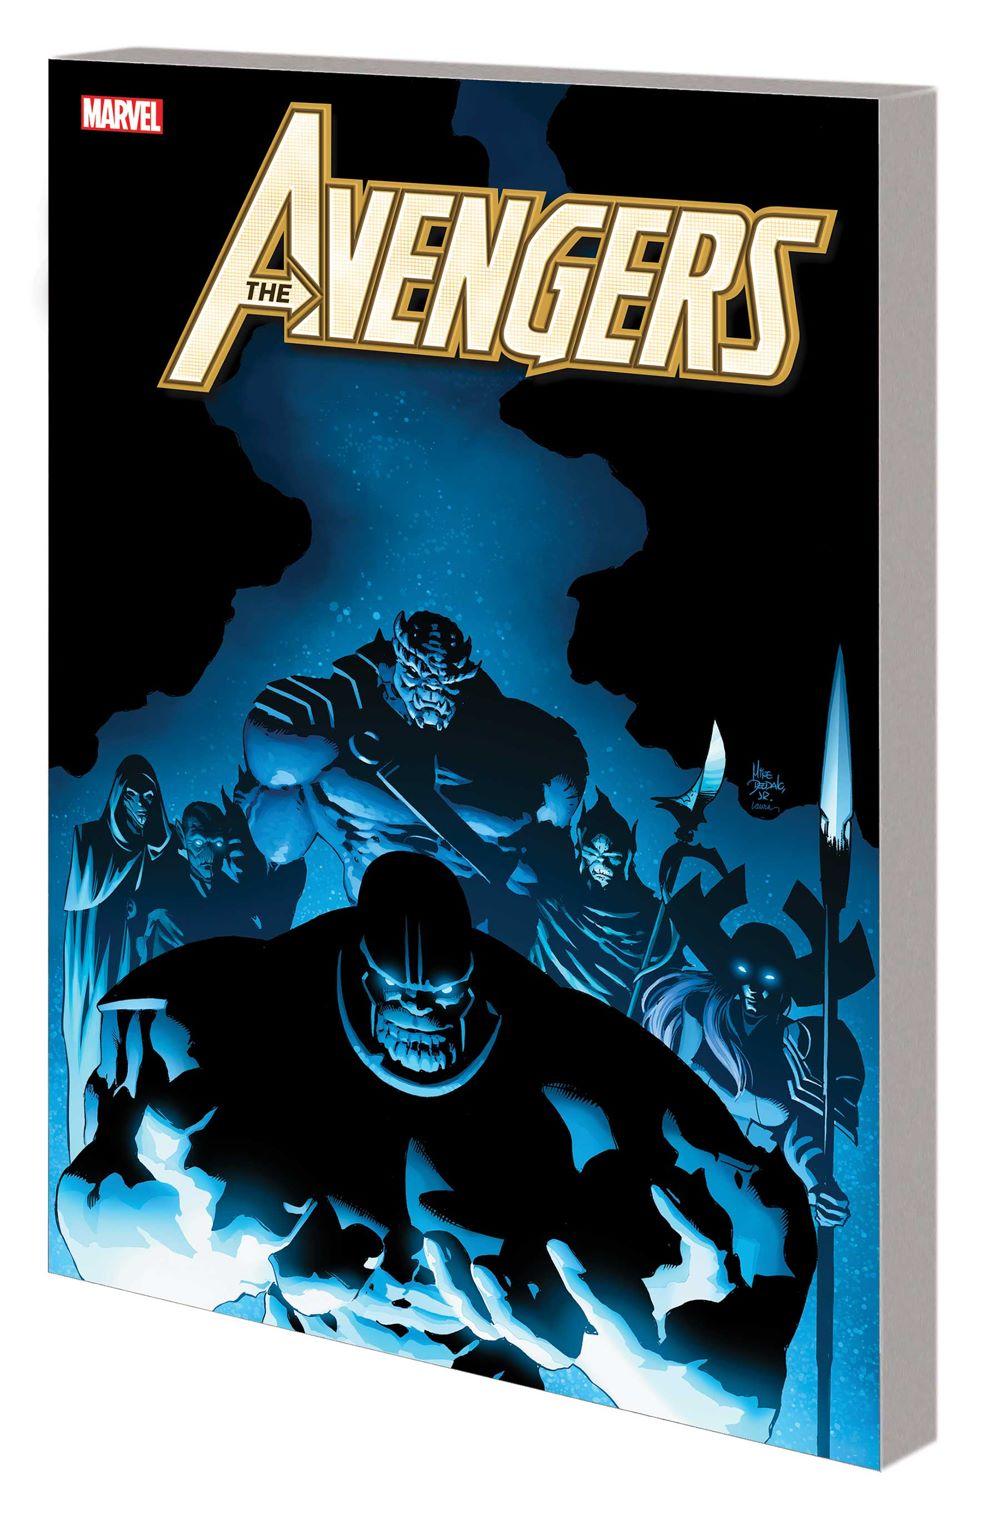 AVENGERS_JH_CC_V3_TPB Marvel Comics January 2021 Solicitations